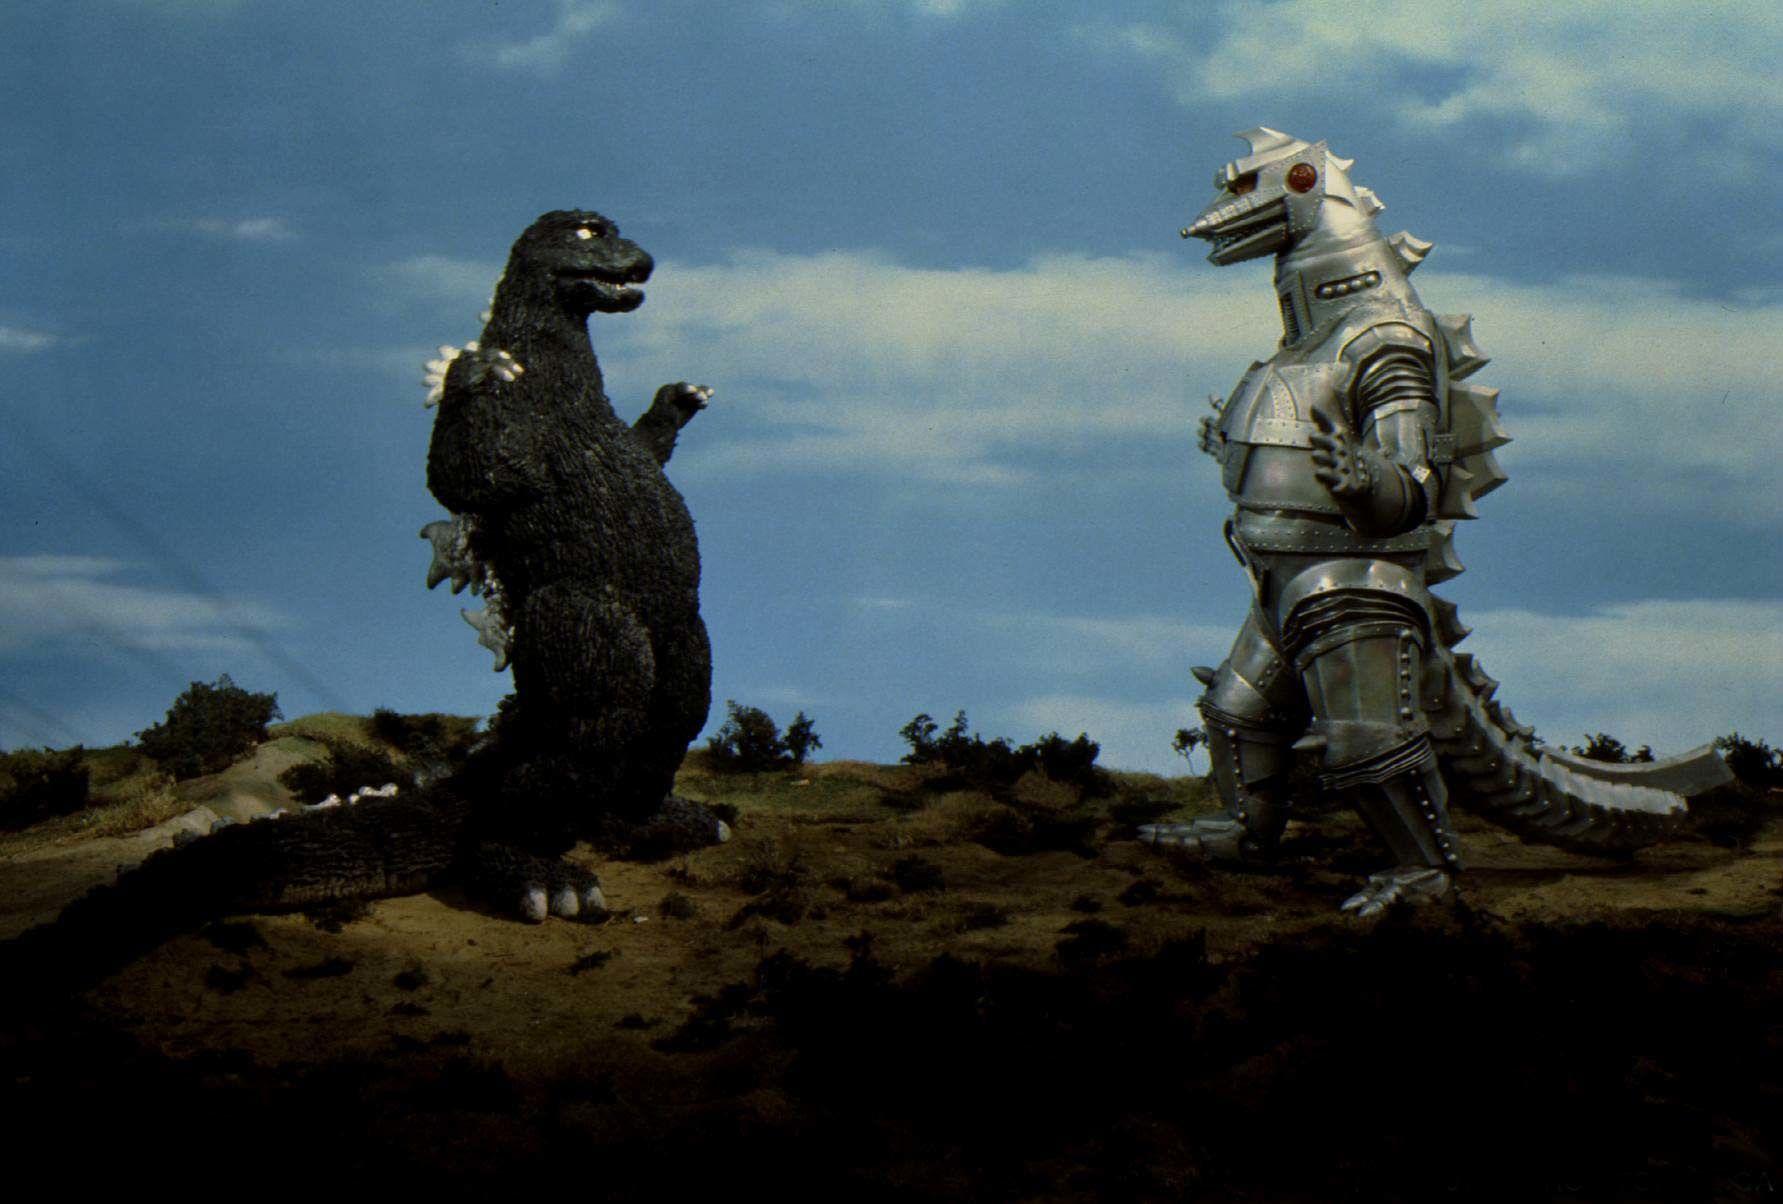 Godzilla 2 — Out in 2018_3